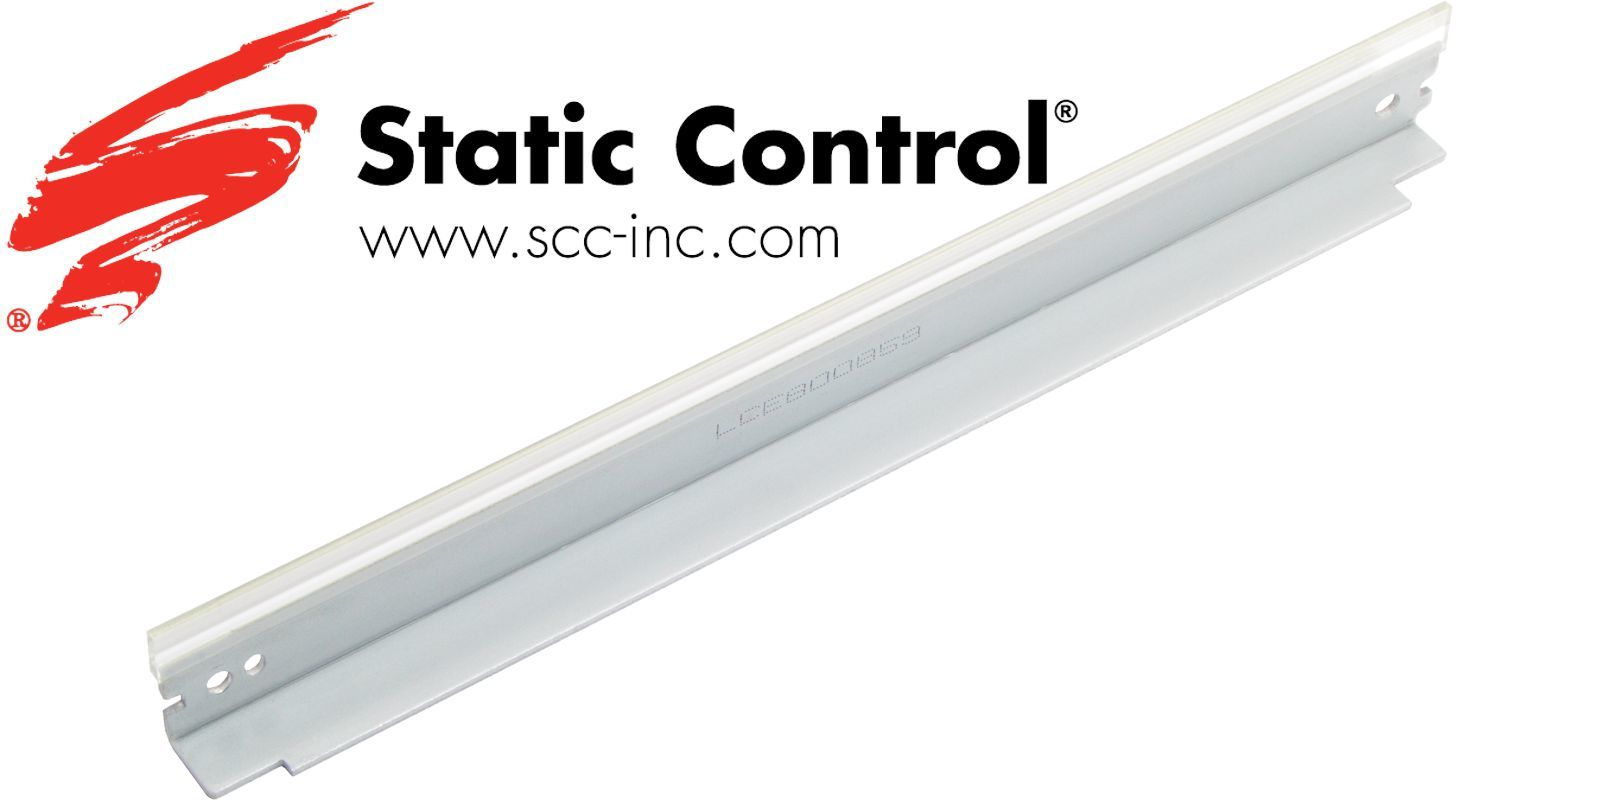 Ракель Static Control© WB CE285A (H1505BLADE2-10) Wiper Blade - чистящее лезвие.